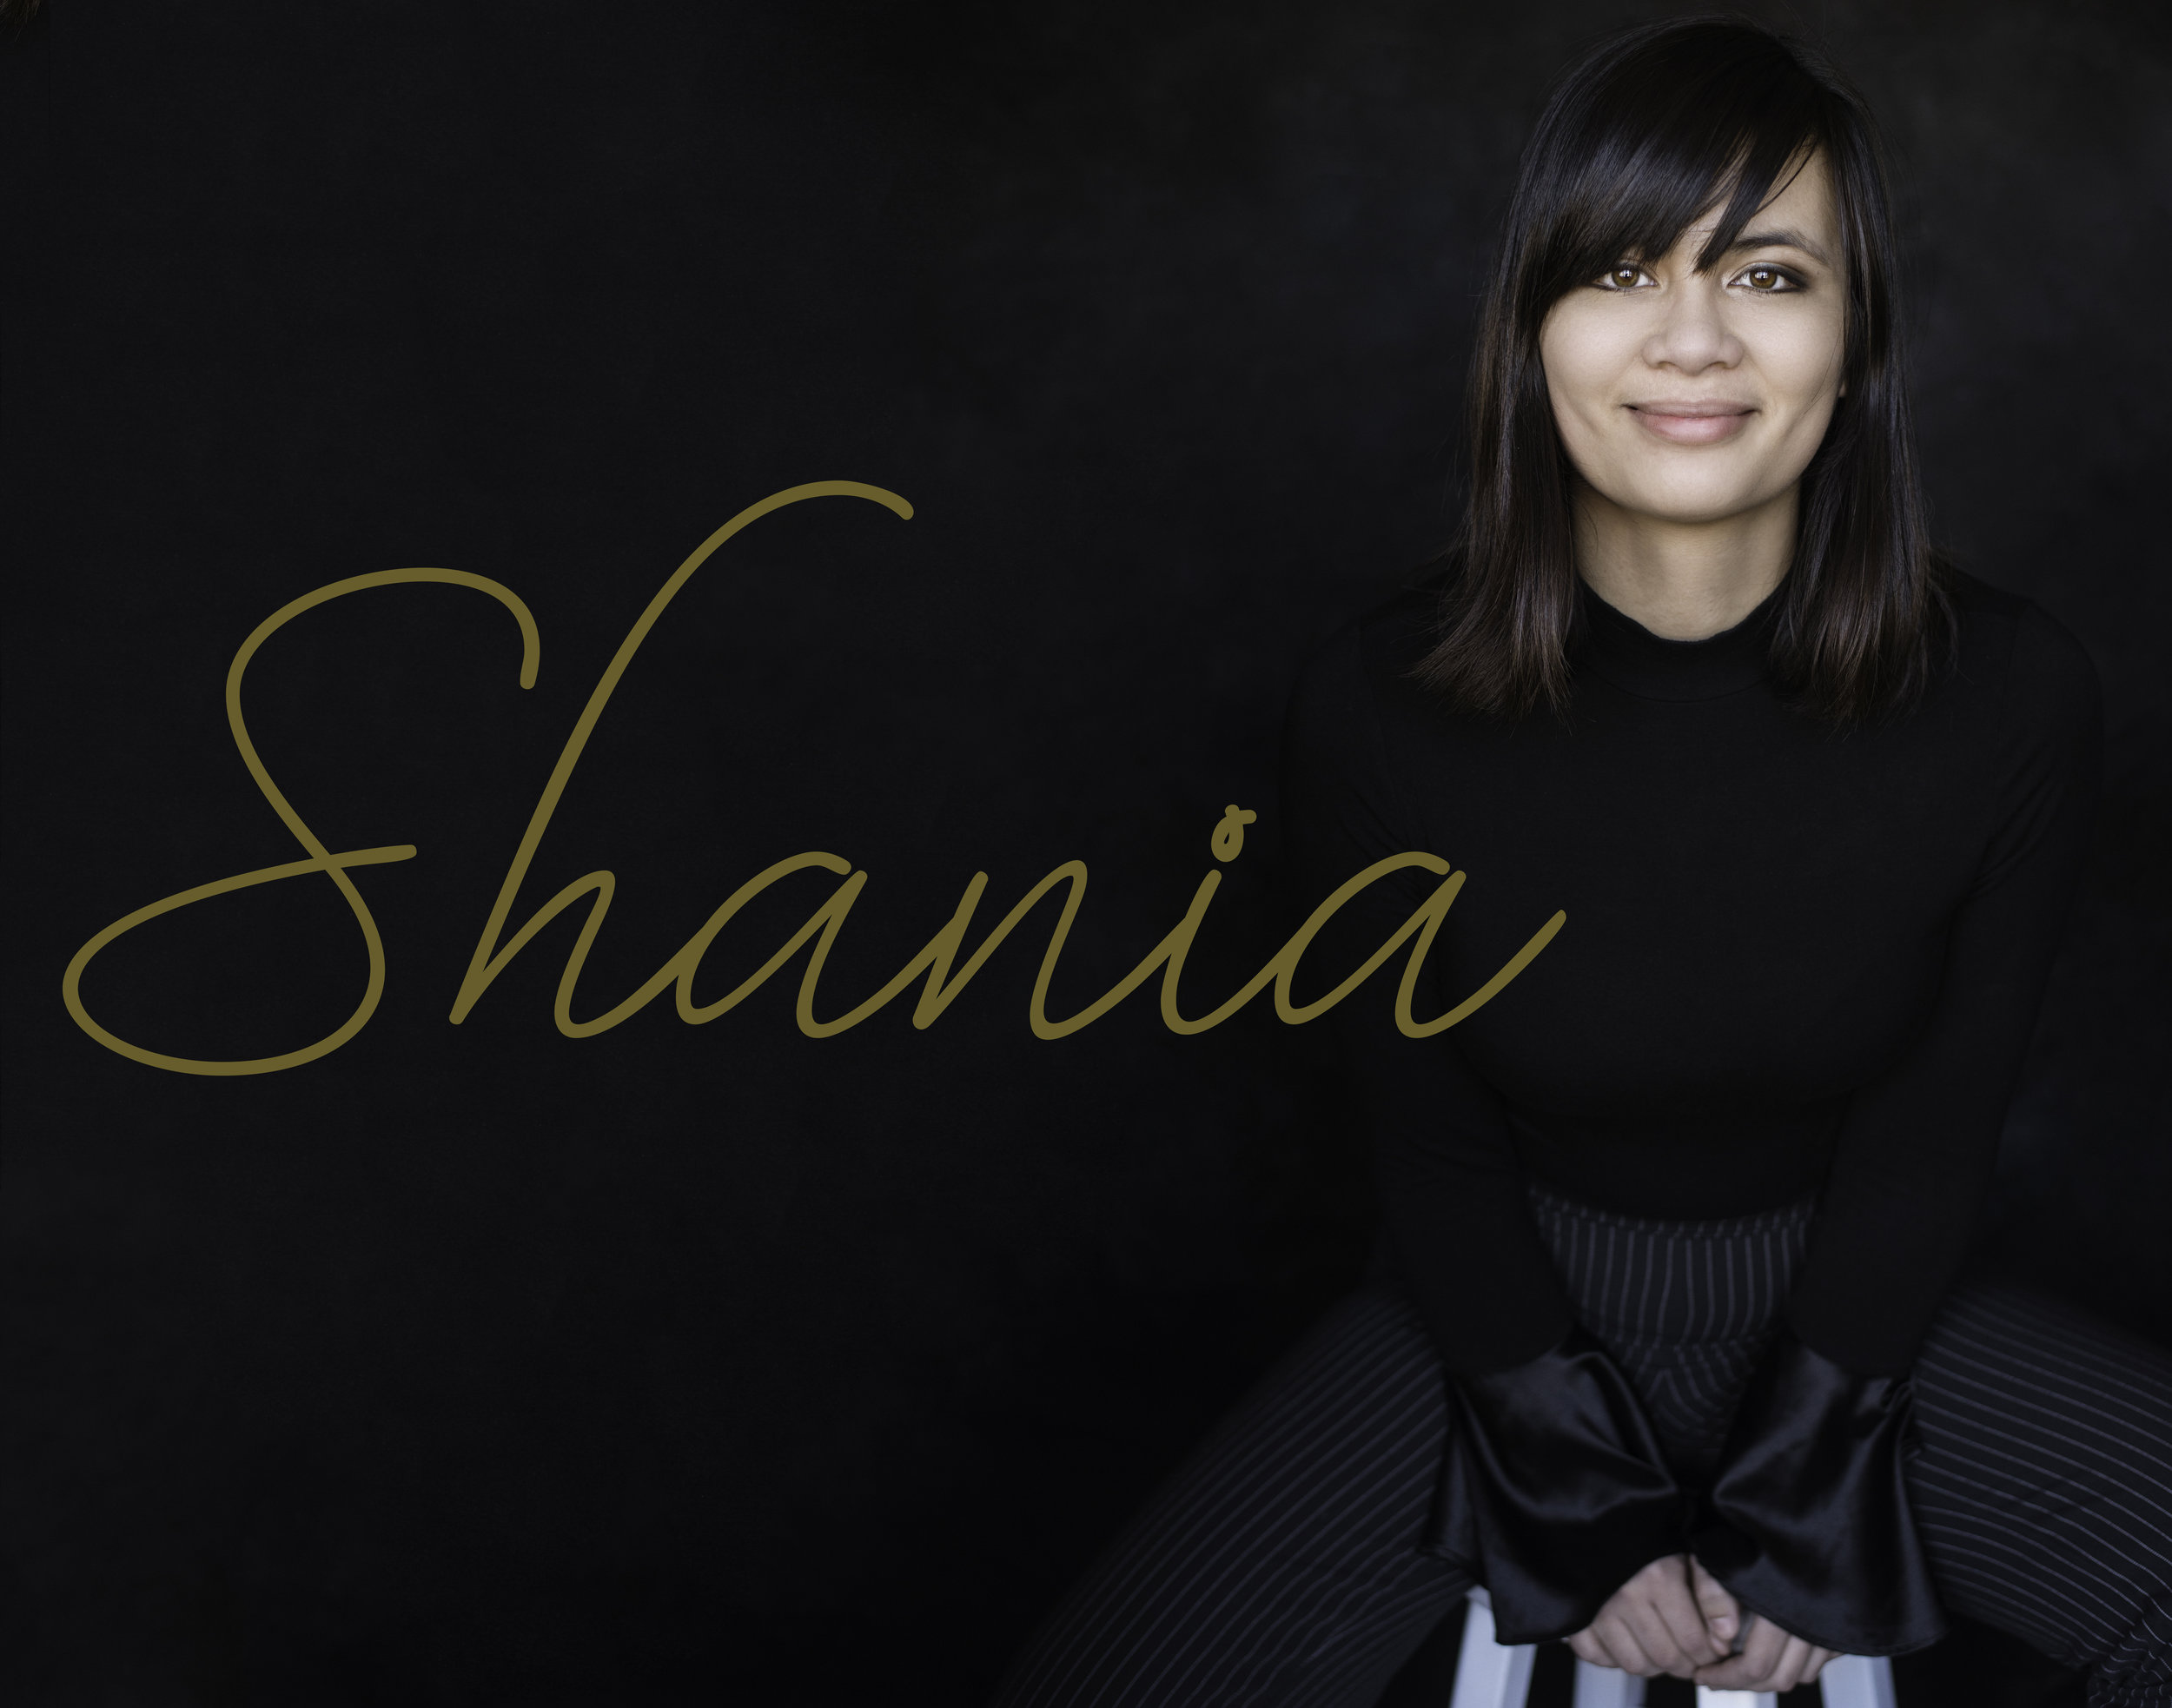 Go Follow her on instagram @shaniagortonpro